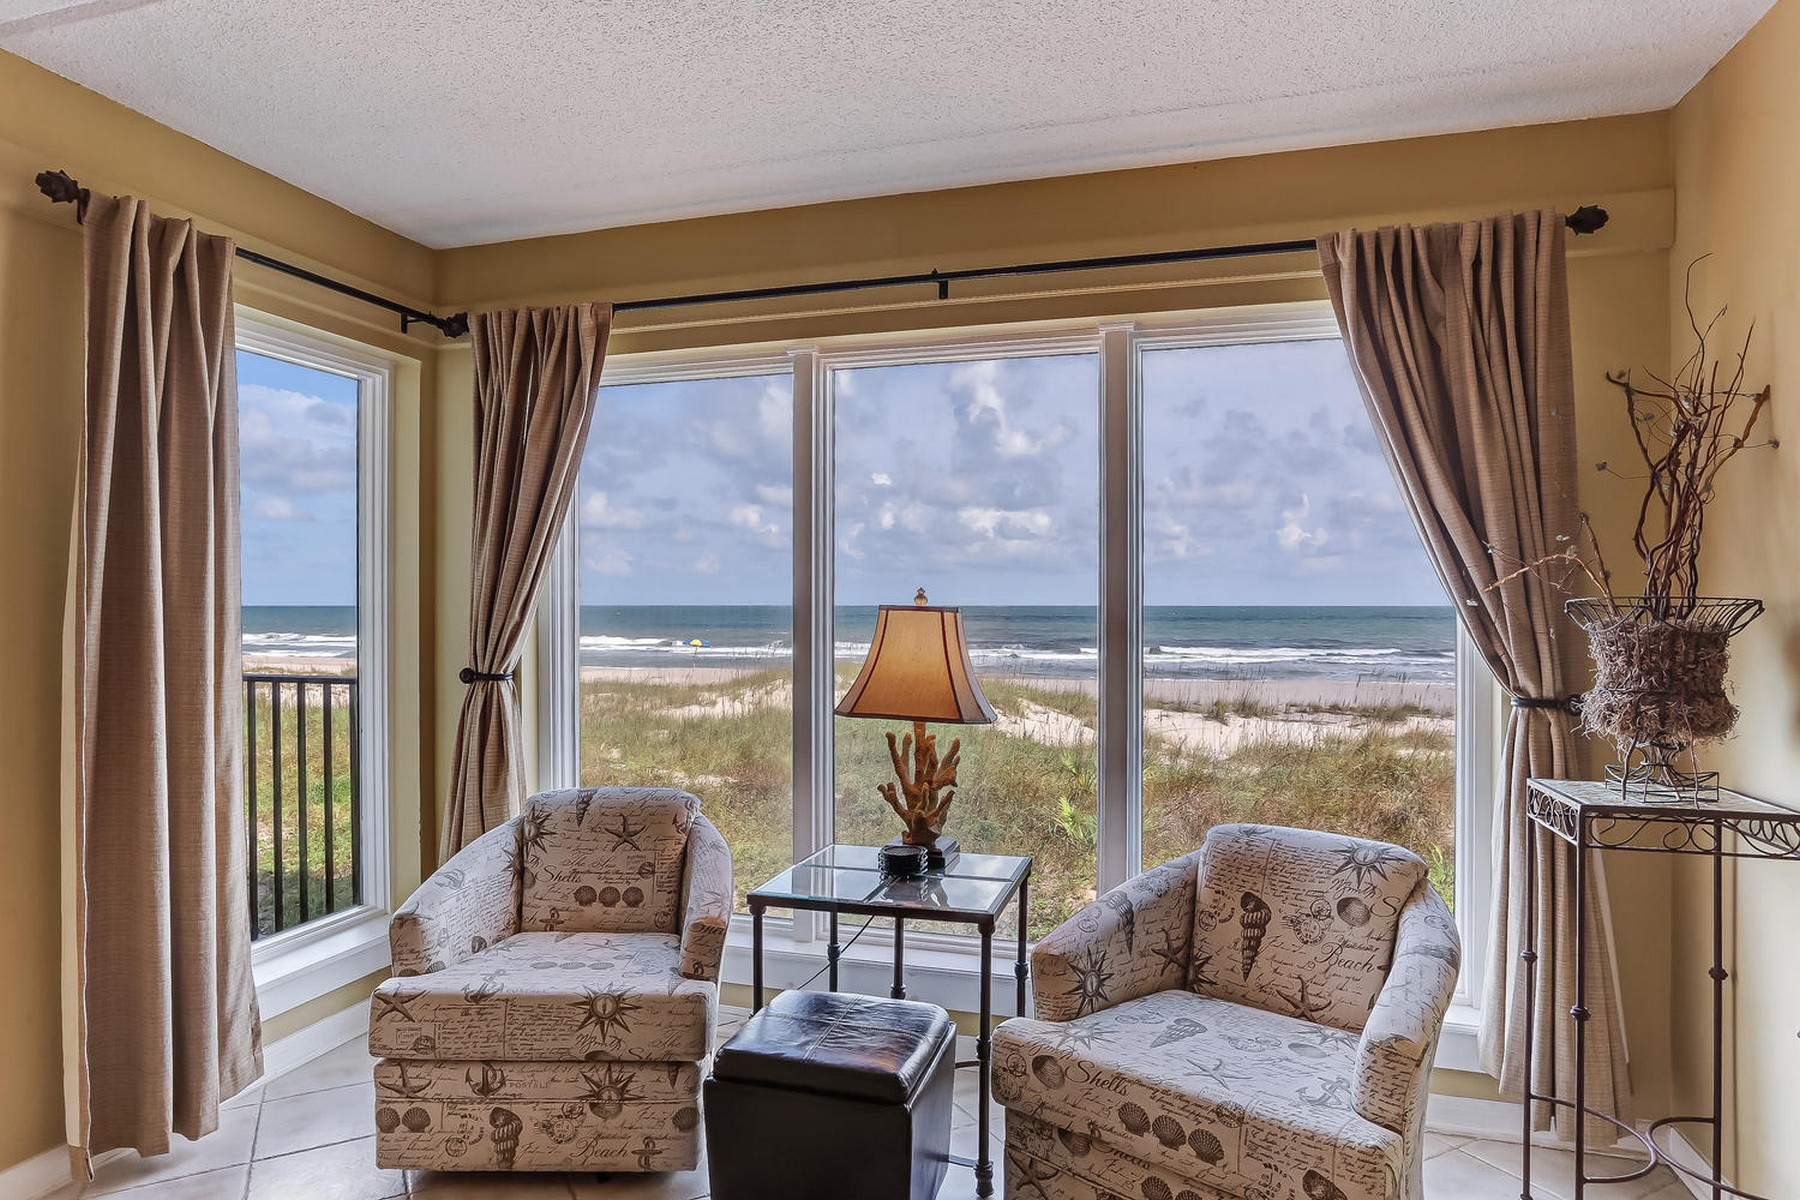 Condominiums for Sale at 382 S Fletcher Avenue Unit 112, Fernandina Beach, Florida 32034 United States